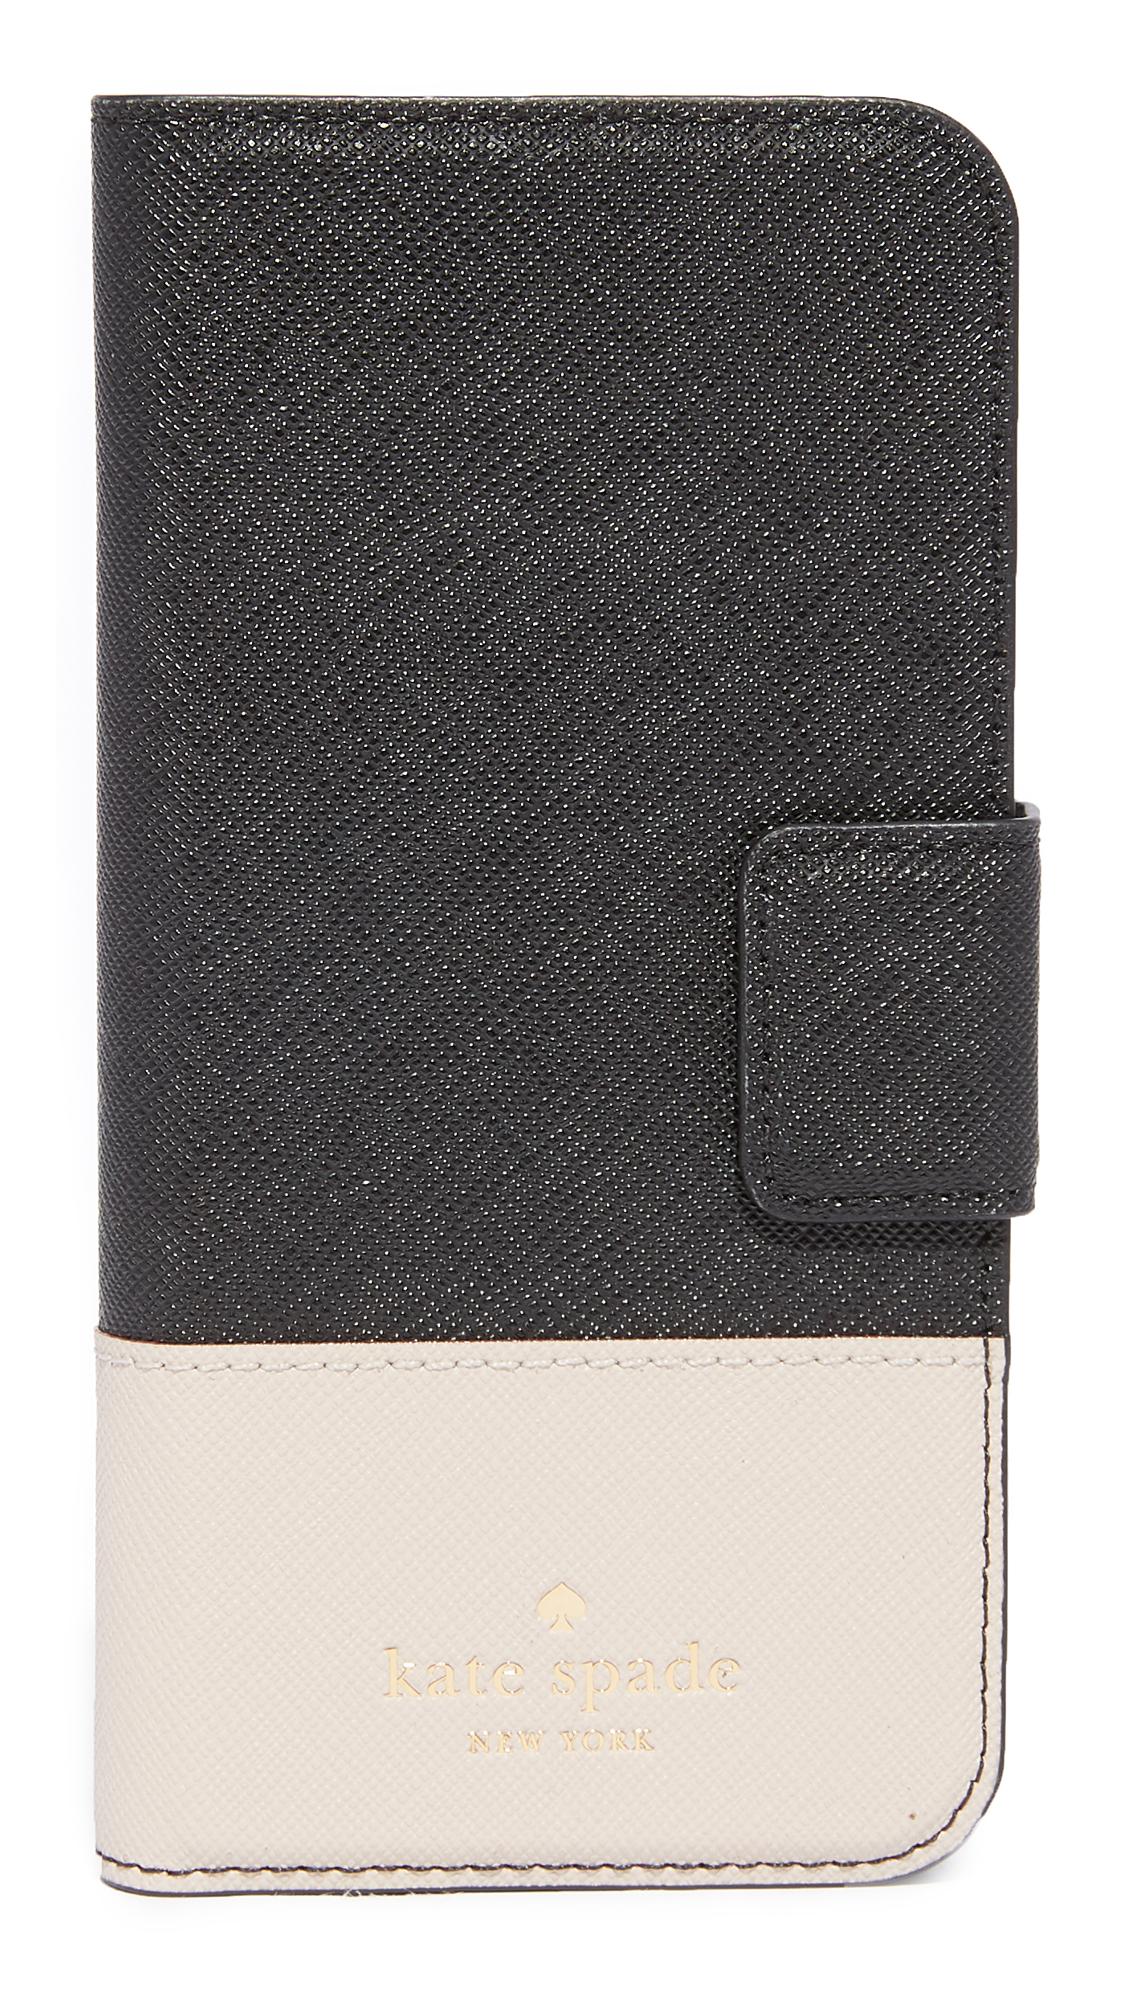 Kate Spade New York Leather Wrap Folio iPhone 7 Case / 8 Case - Black/Tusk